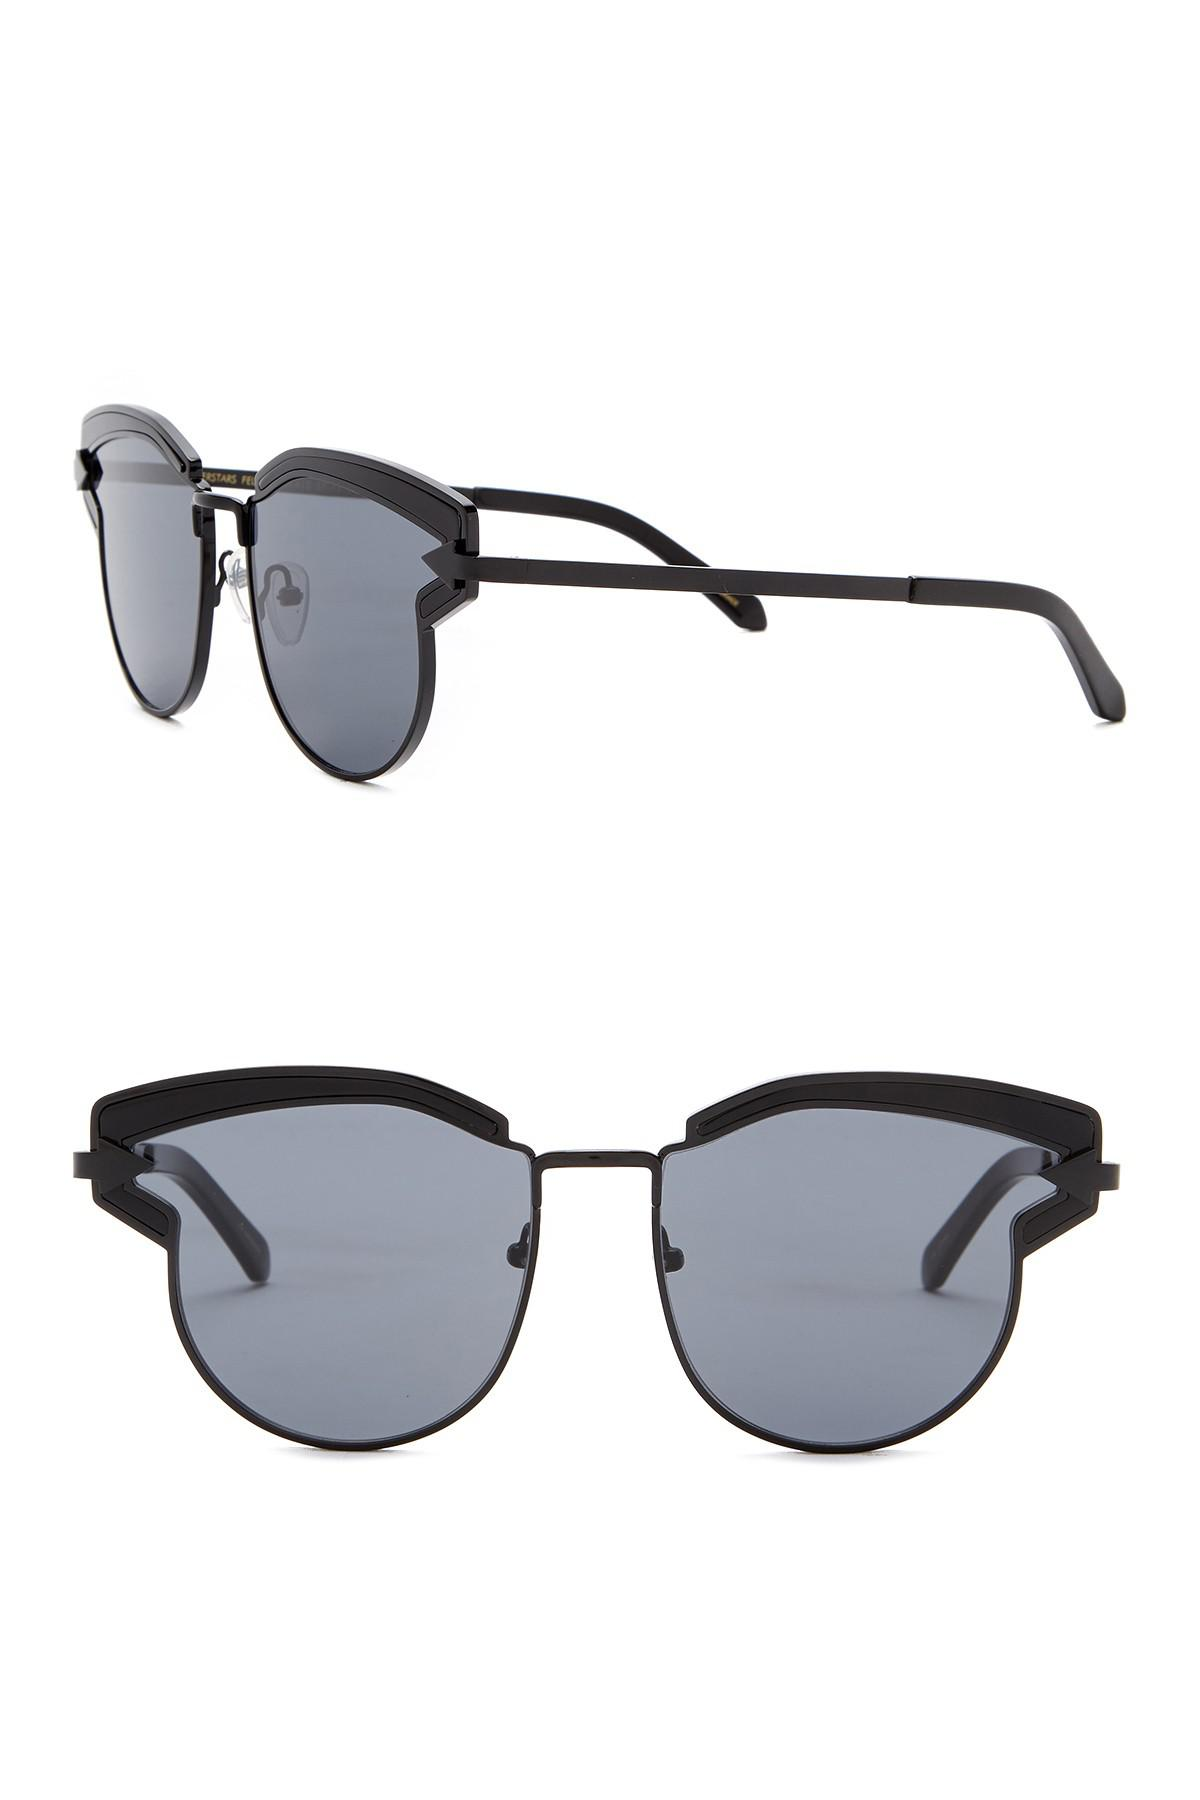 43f114362a1 Karen Walker 57mm Superstars Felipe Sunglasses in Black - Lyst